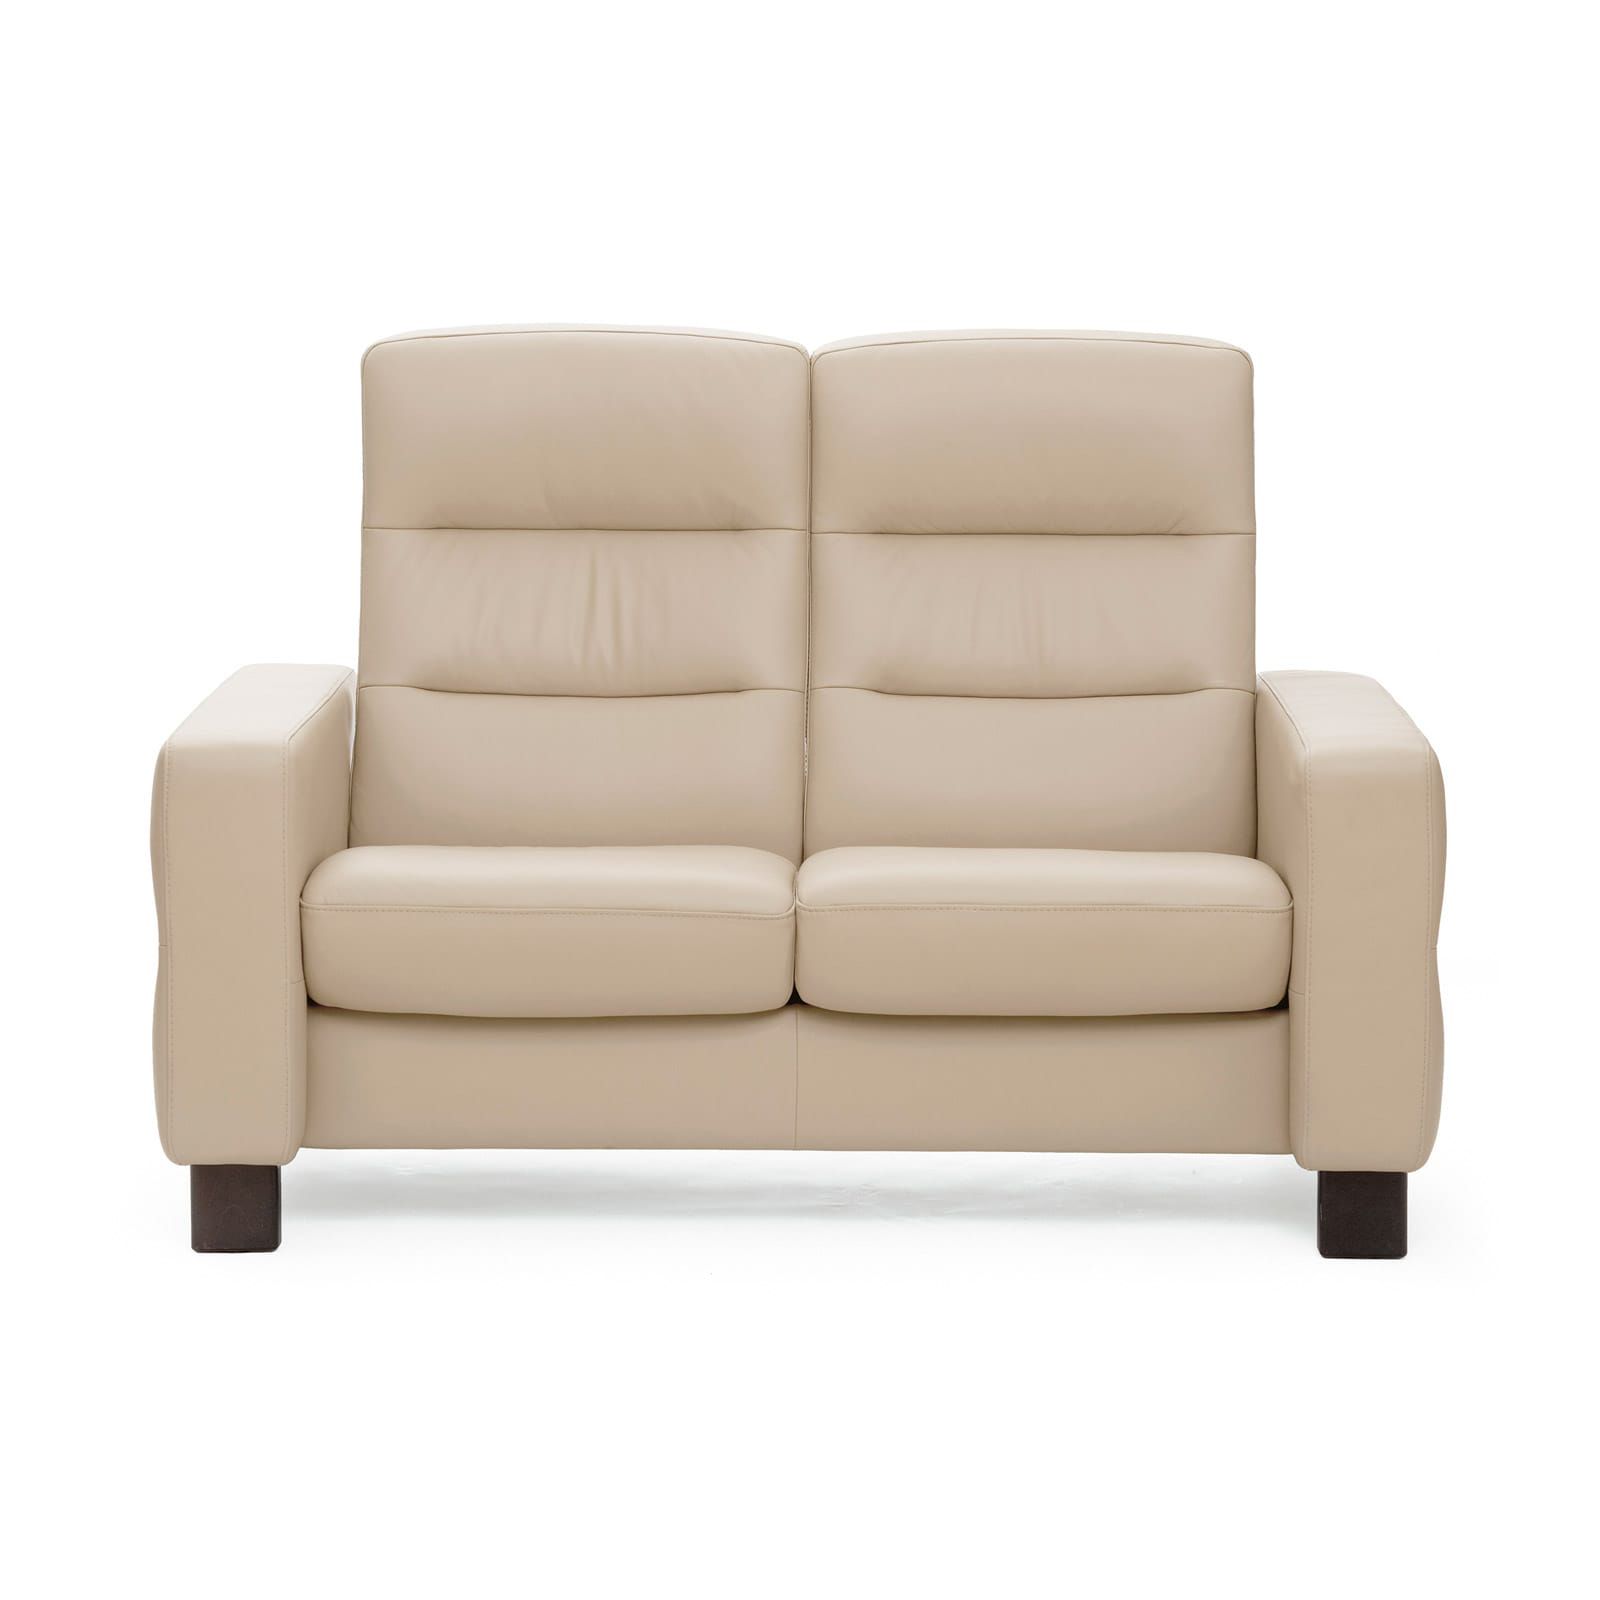 stressless sofa 2 sitzer wave m hoch batick cream. Black Bedroom Furniture Sets. Home Design Ideas